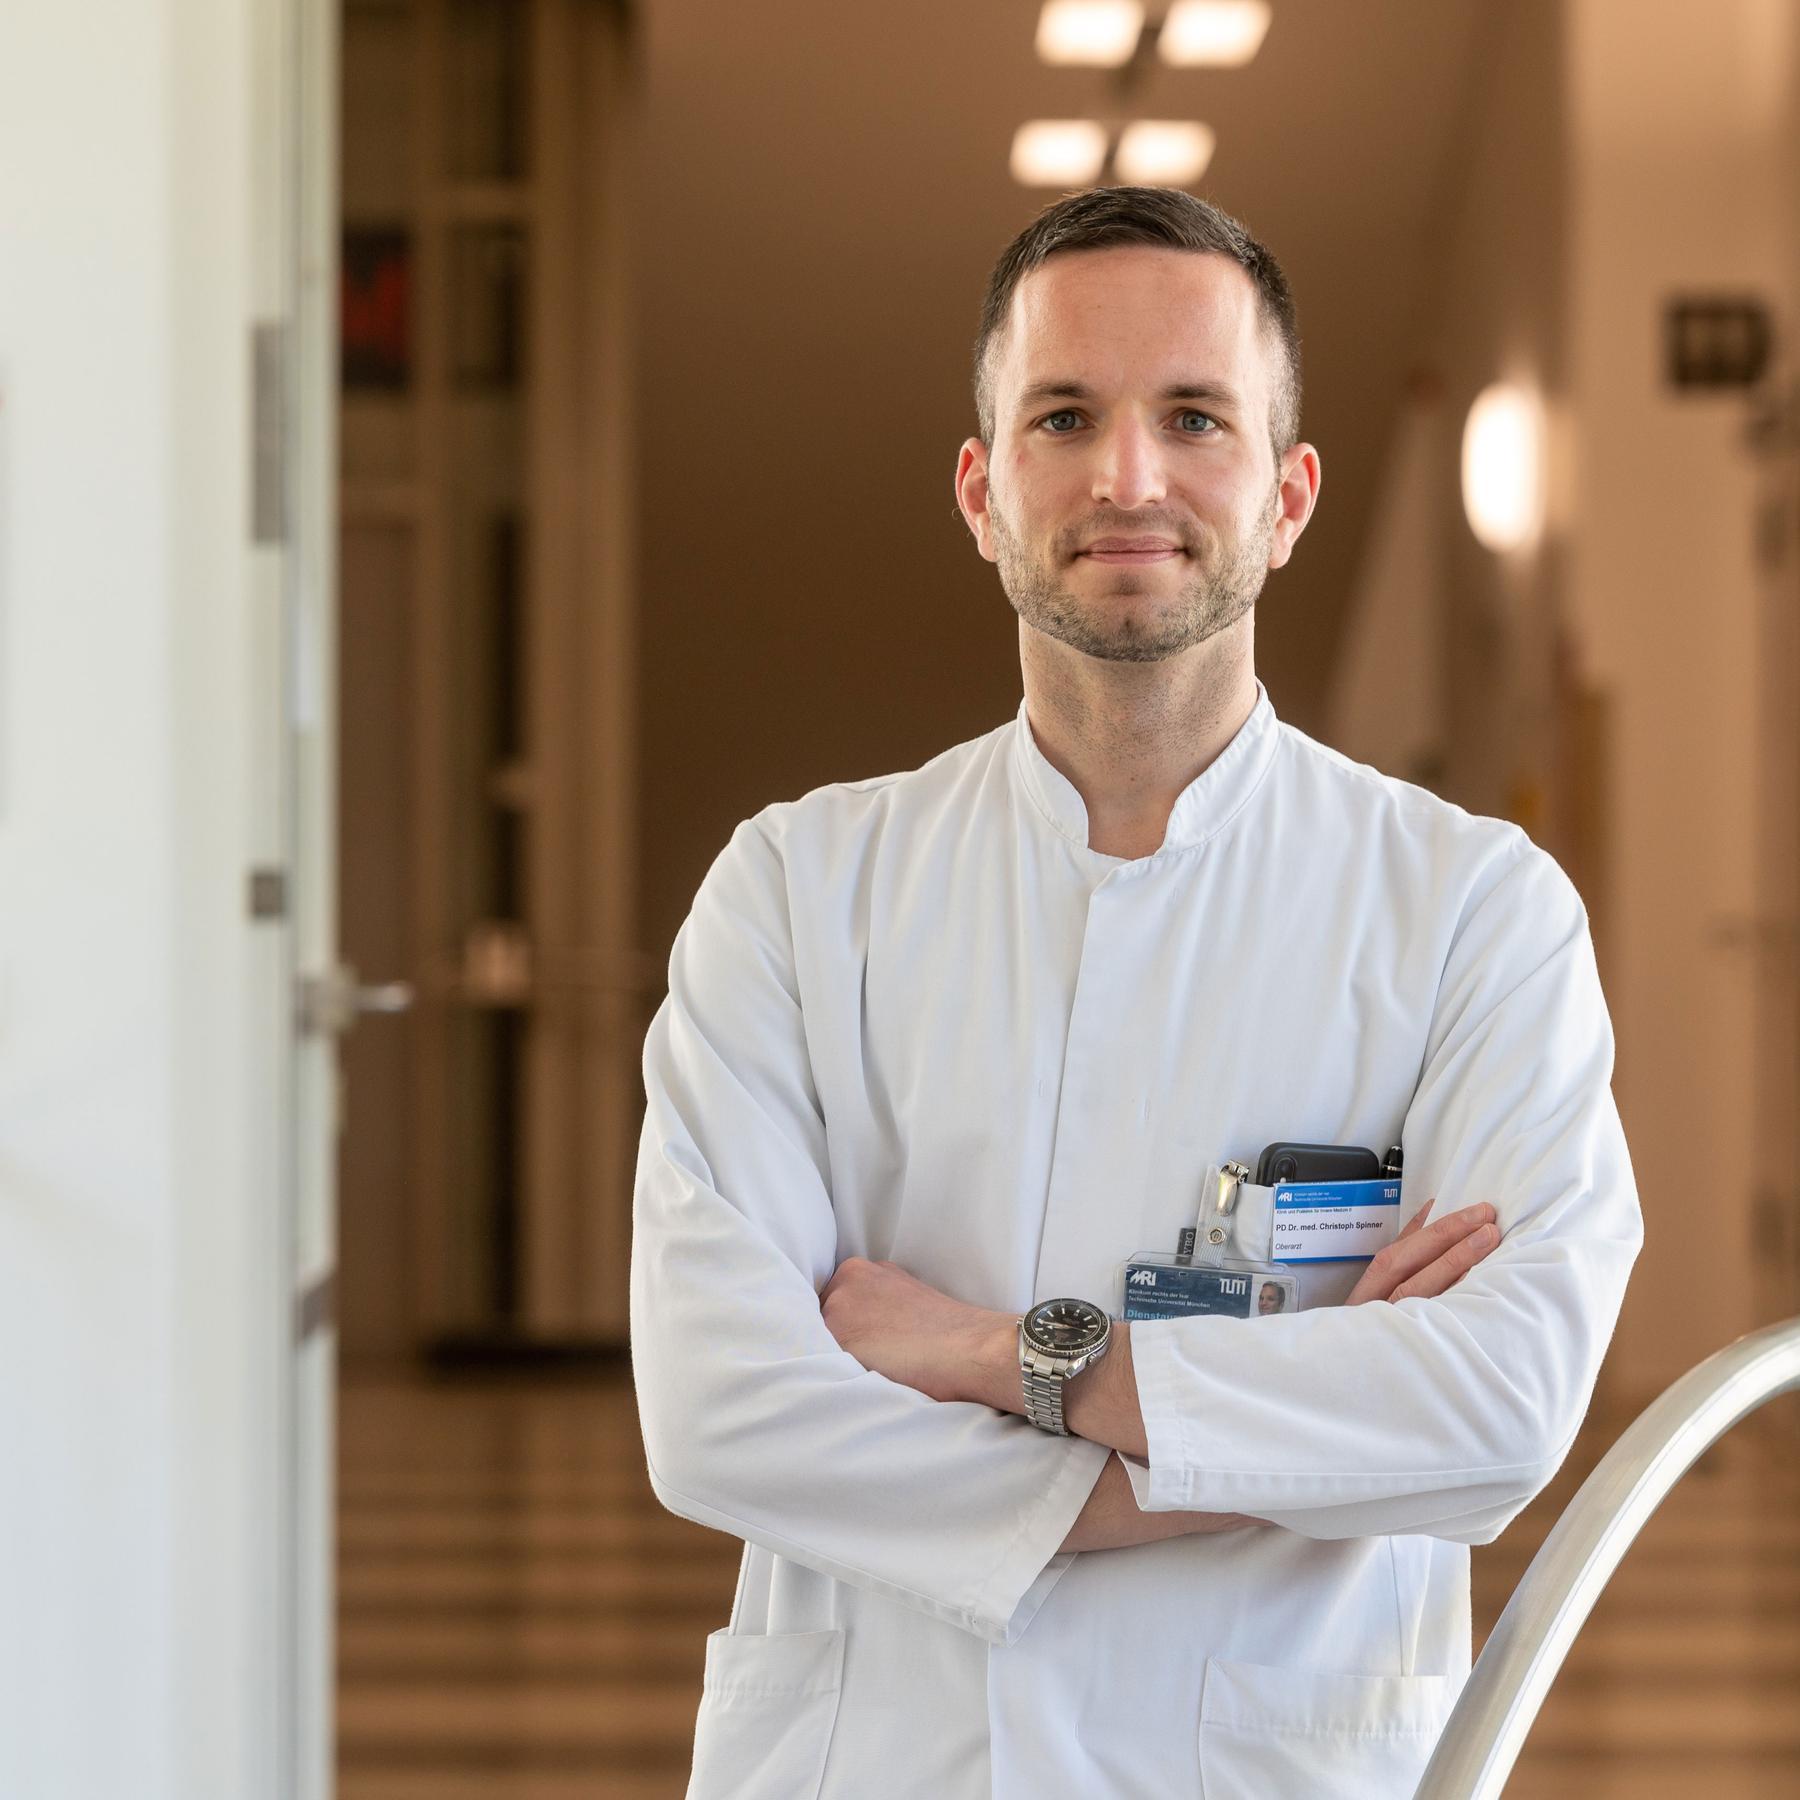 Corona-News mit Dr. Christoph Spinner (10.08.2021)